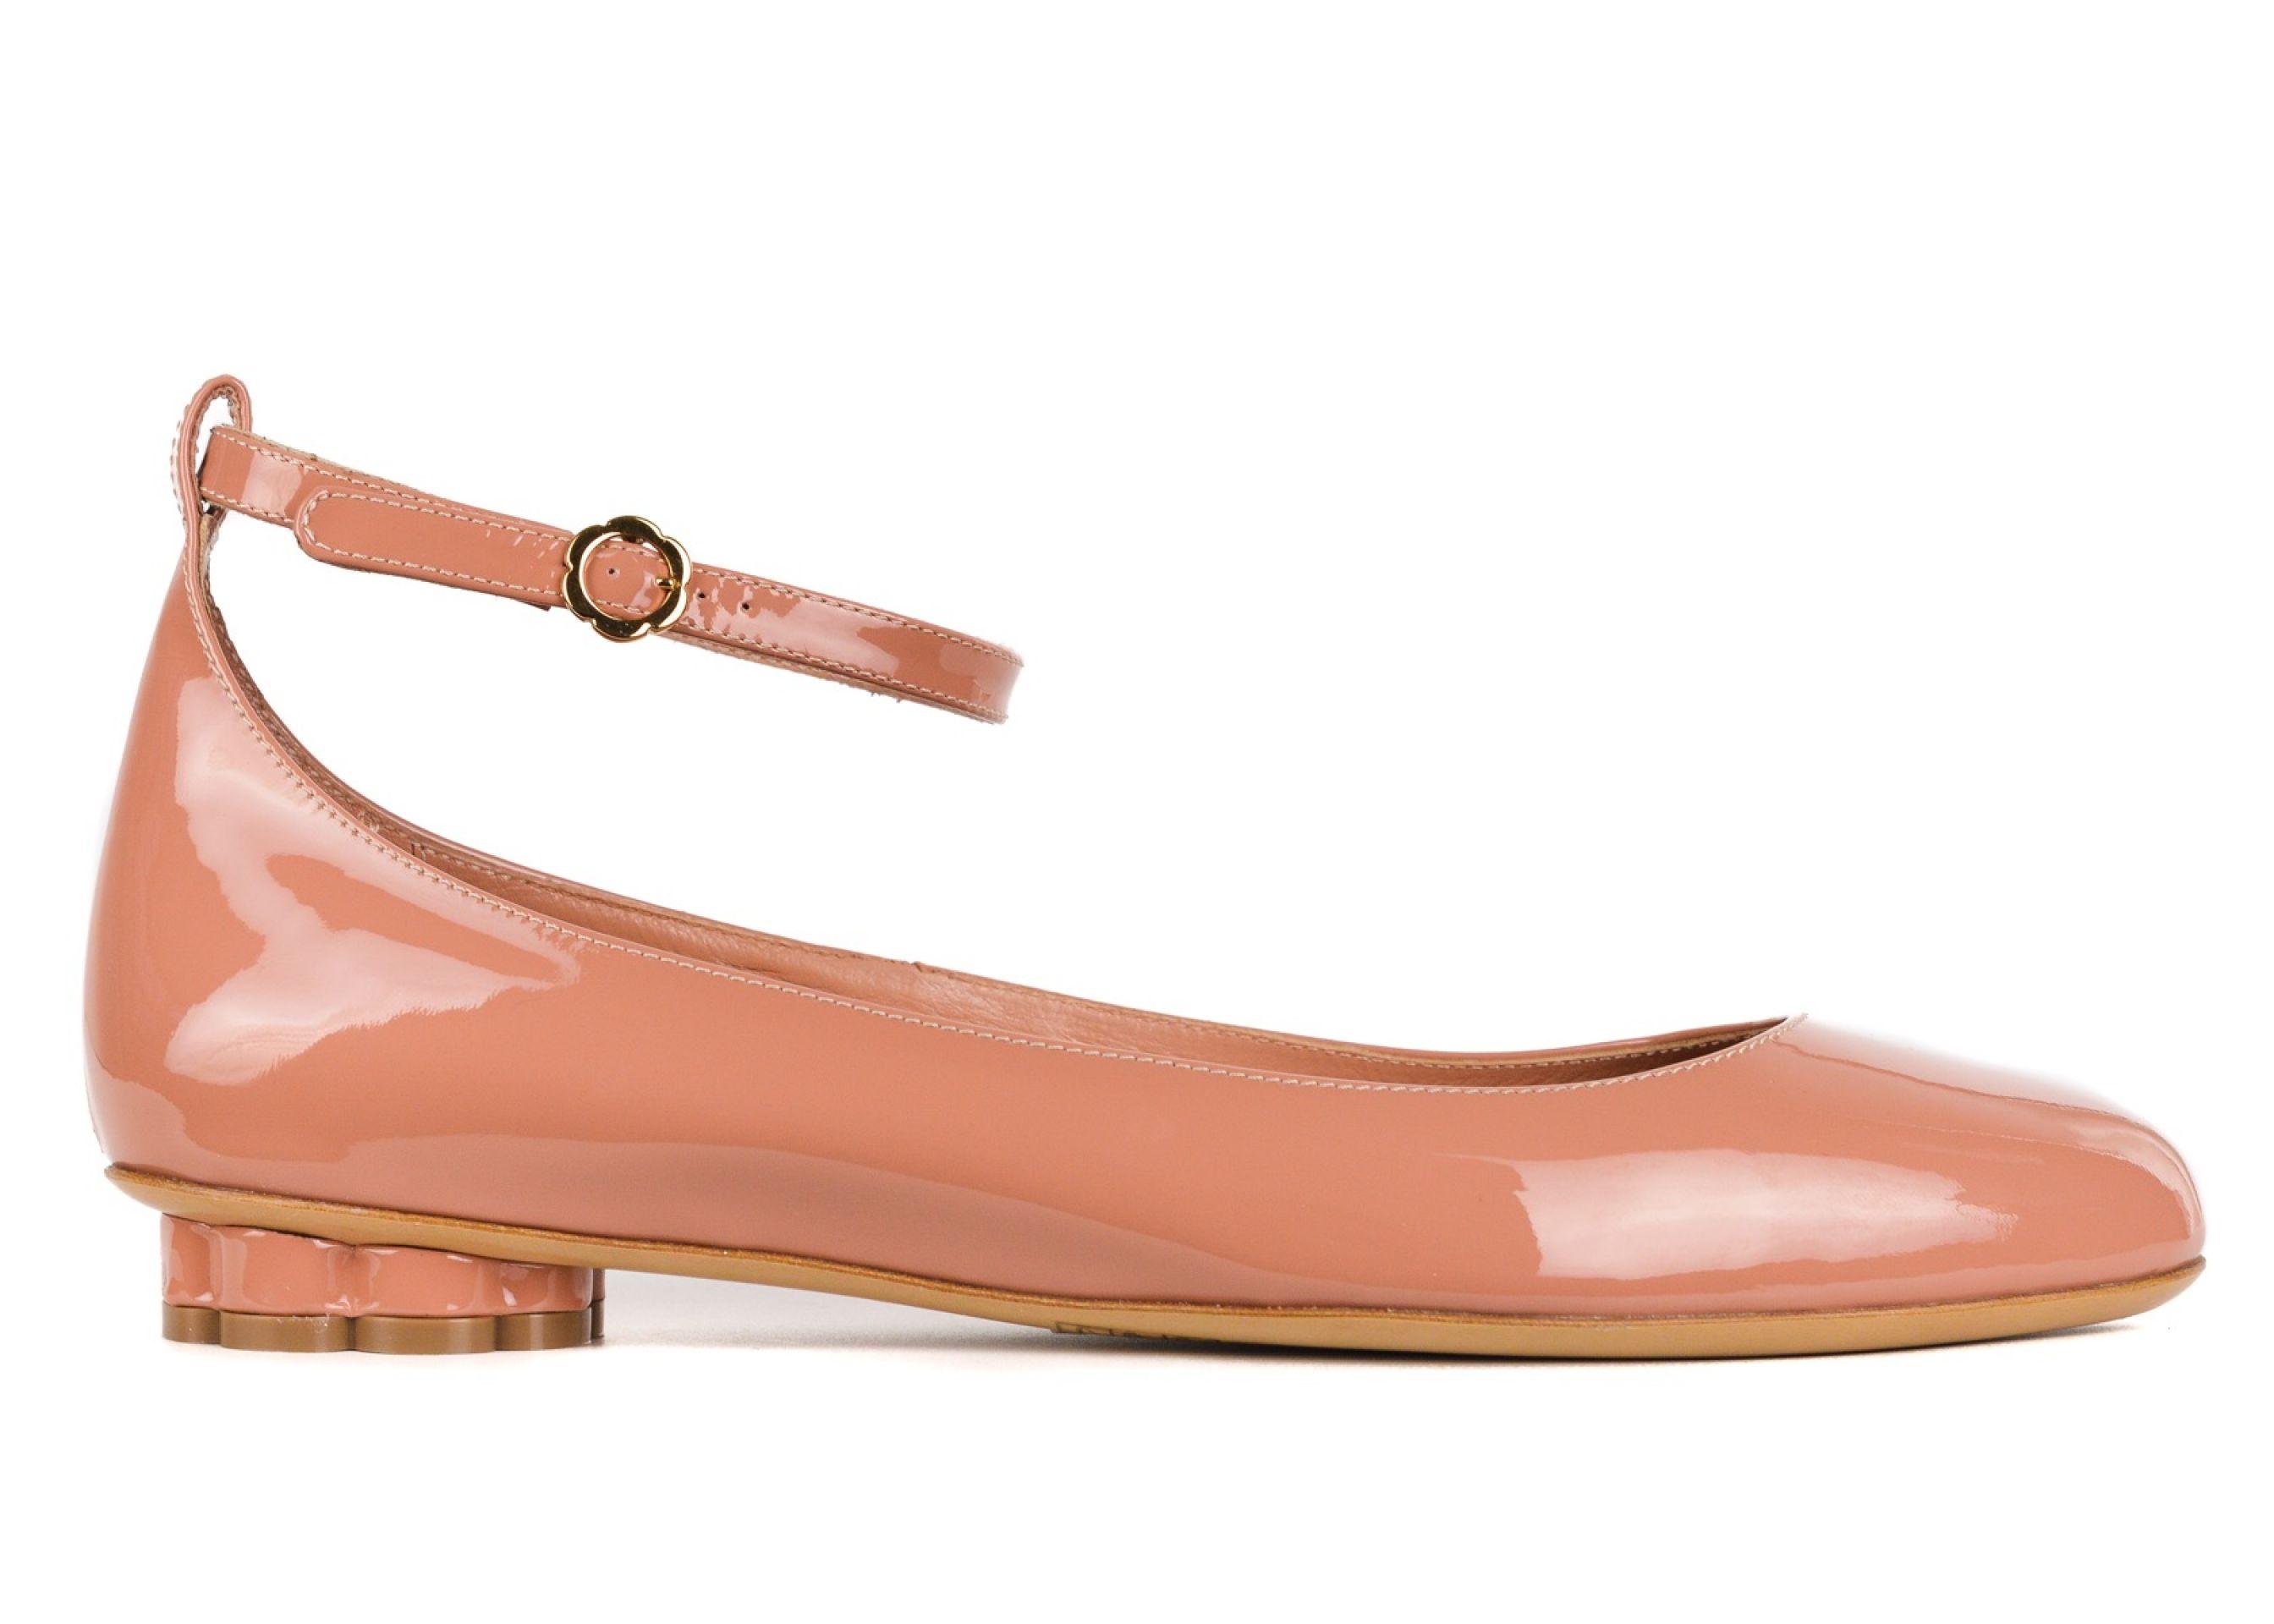 Salvatore Ferragamo Womens Blush Patent Leather Cefalu Flats